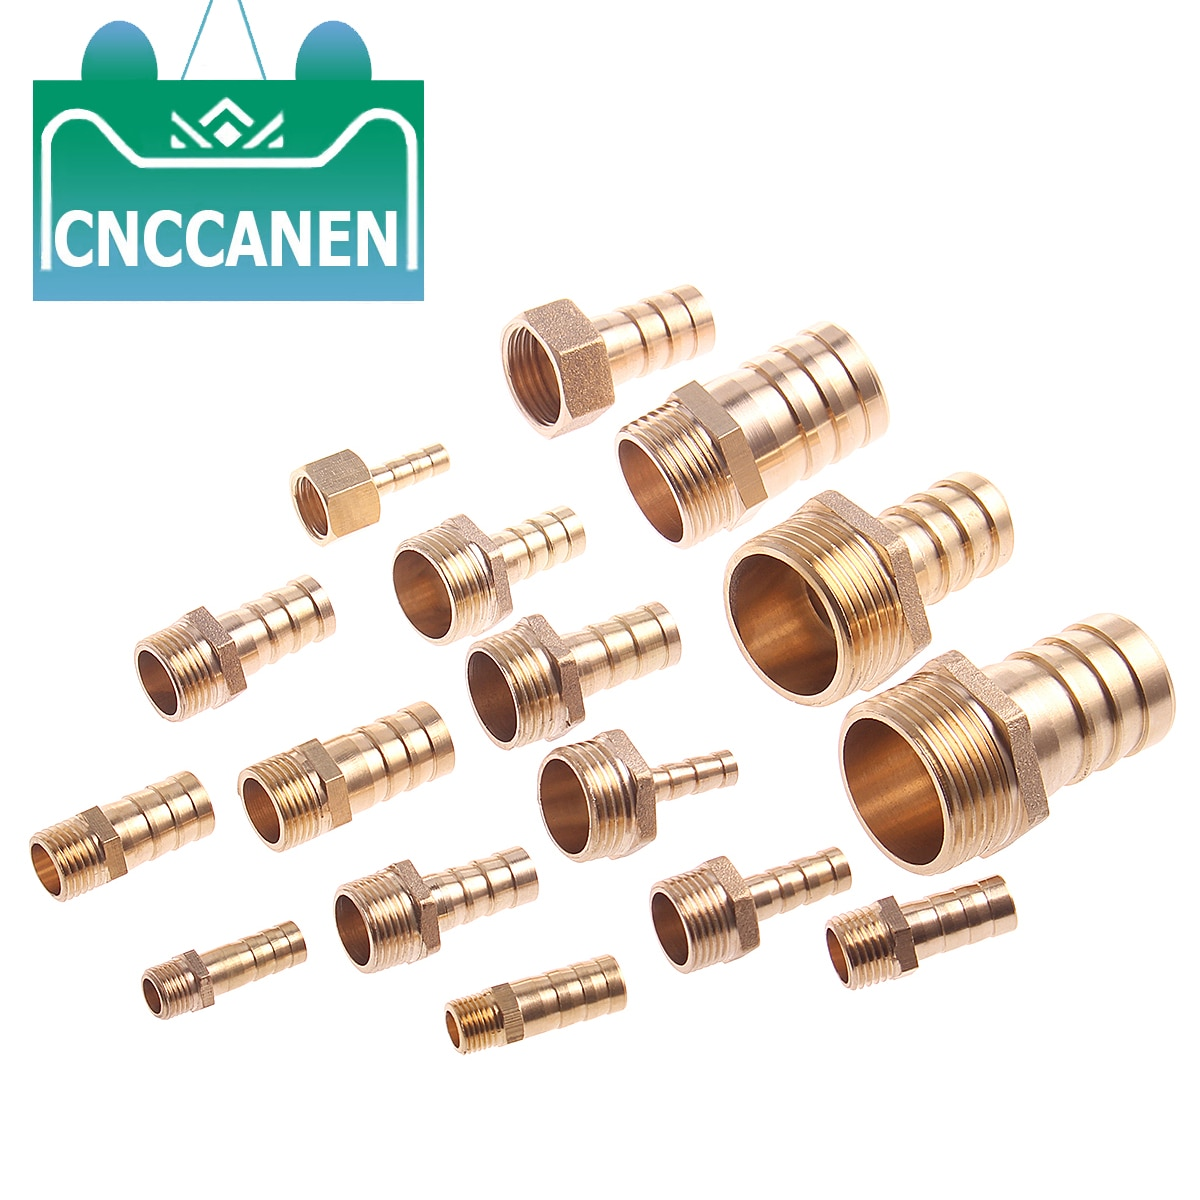 "Lengüeta de manguera de cola 6/8/10/12/14/16/19/25MM conector de tuberías de latón 1/8 ""1/4"" 3/8 ""1/2"" 1 ""BSP conector macho adaptador acoplador de cobre"